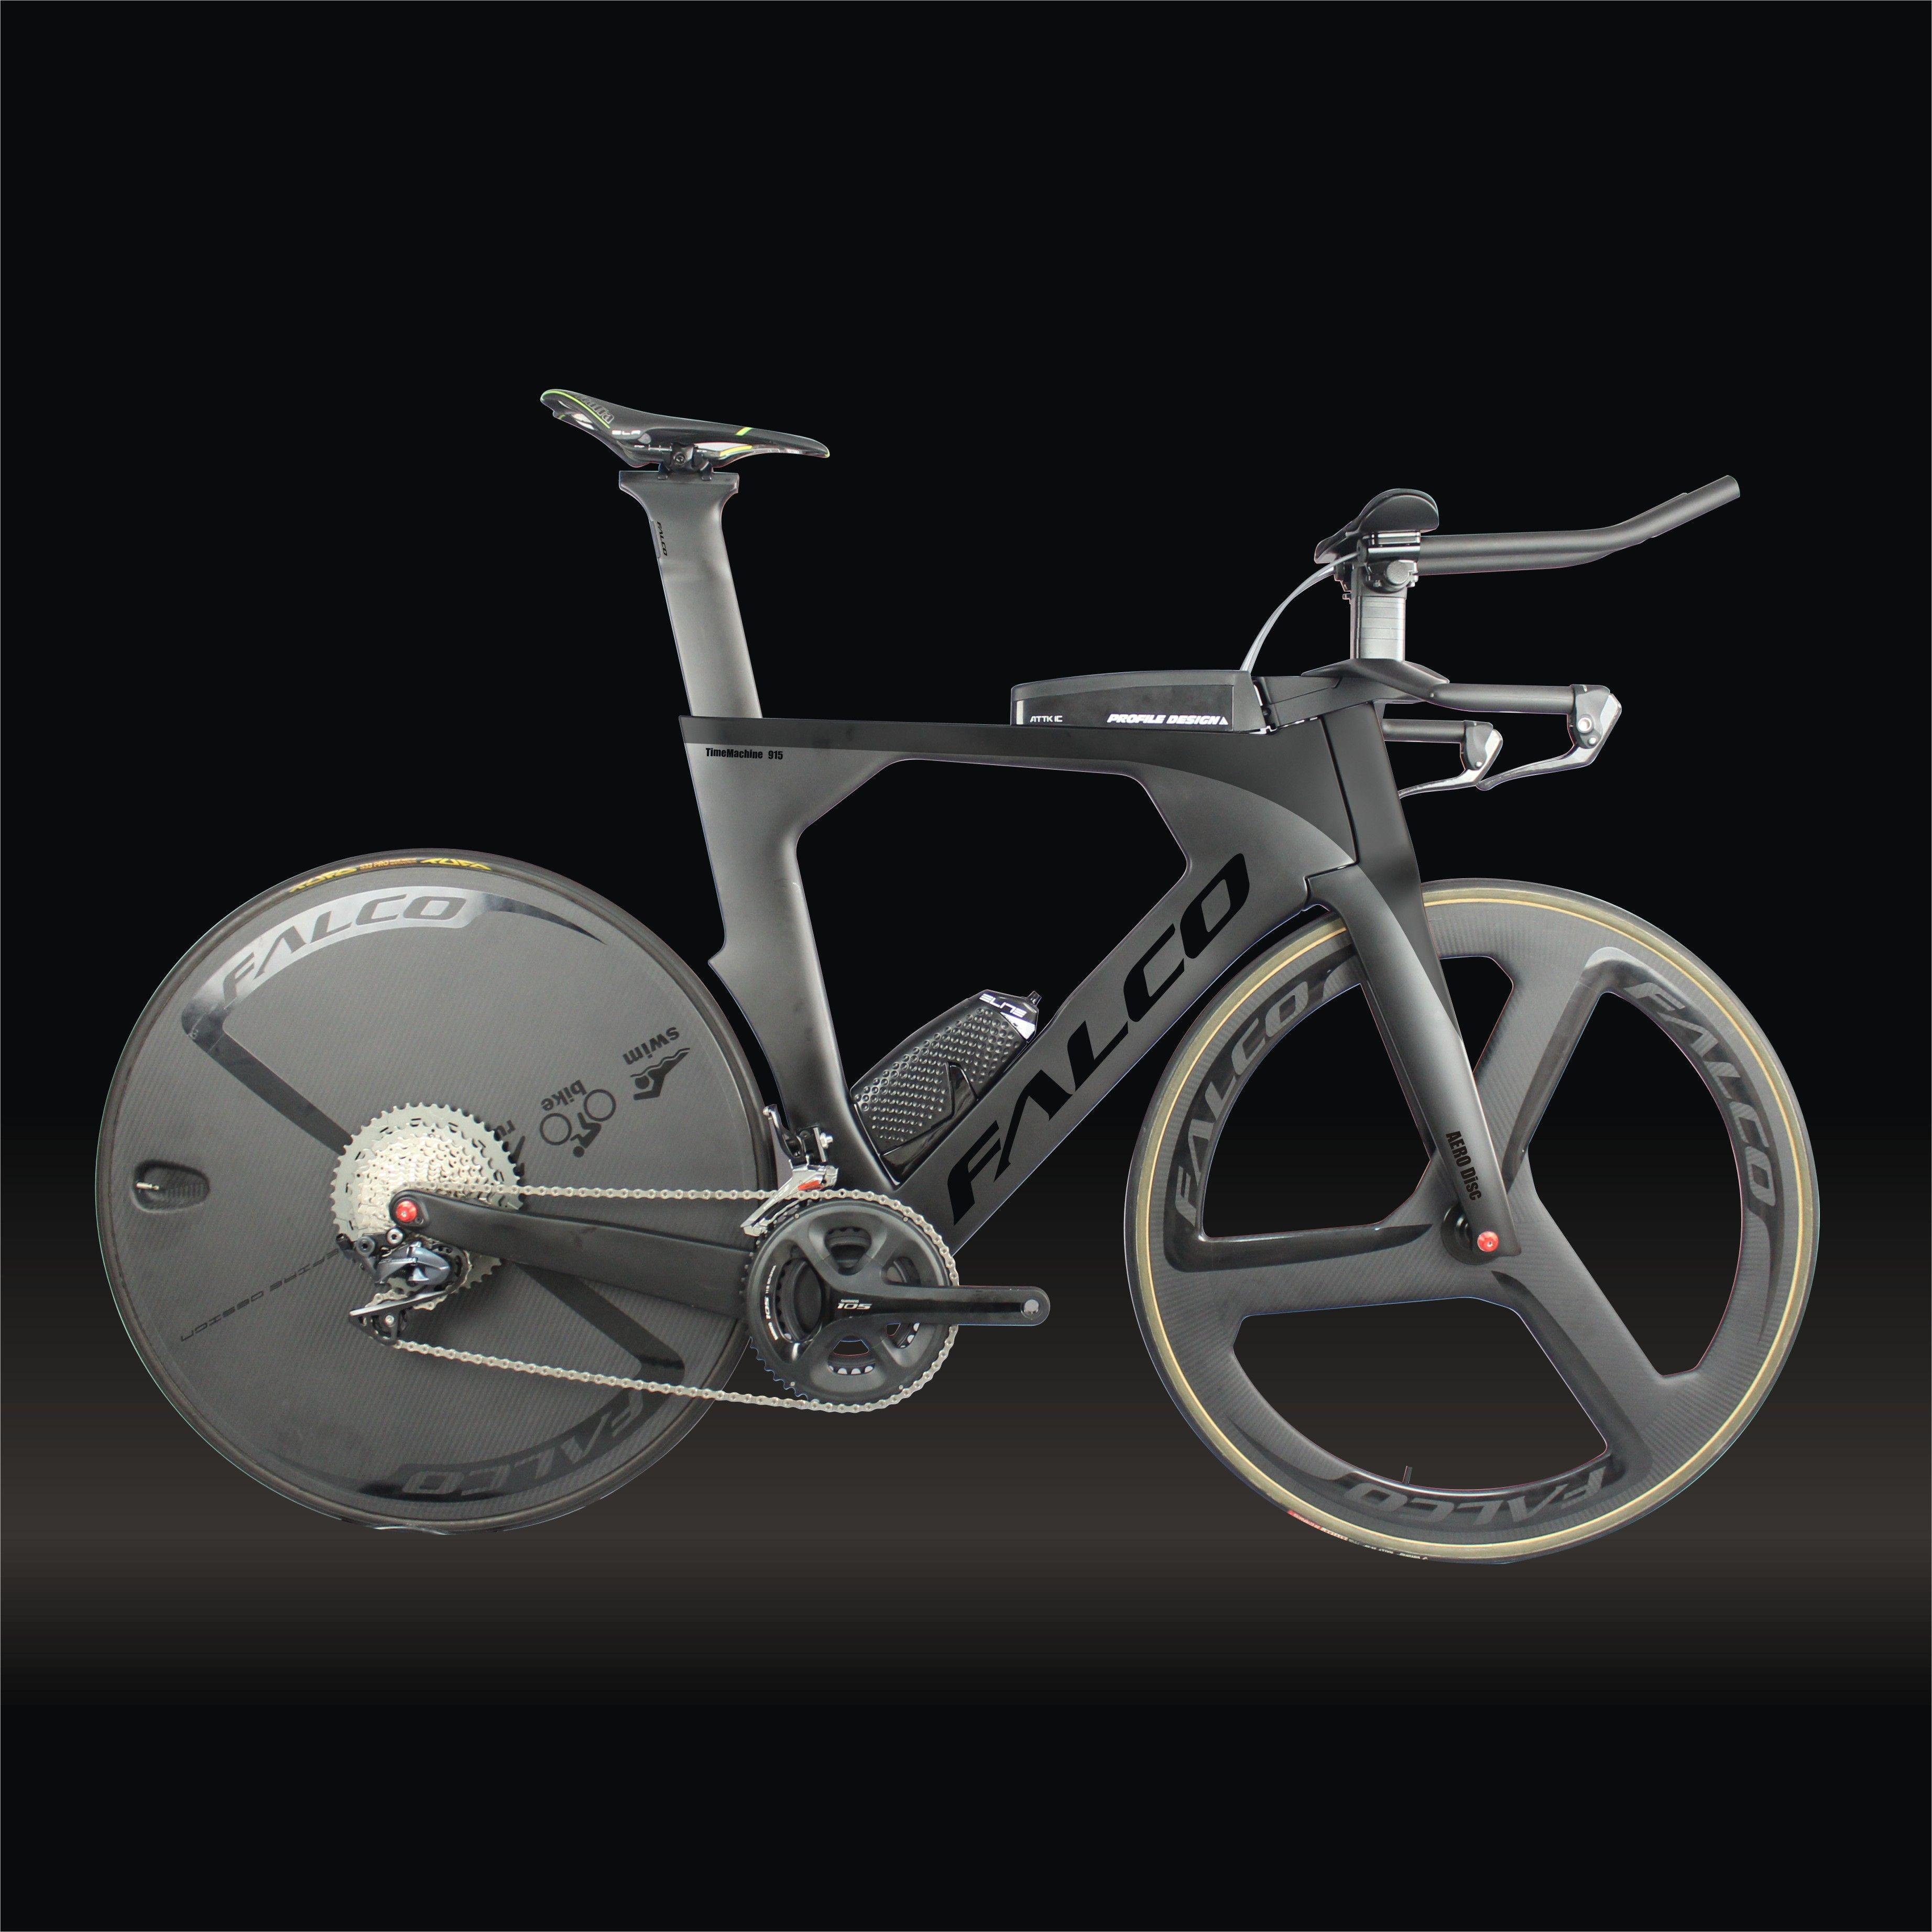 MIRACLE bikes 2020 Carbon triathlon bike 48/52/54/56/58cm Carbon tt Rahmen Carbon zeitfahren Fahrrad Rahmen TT915